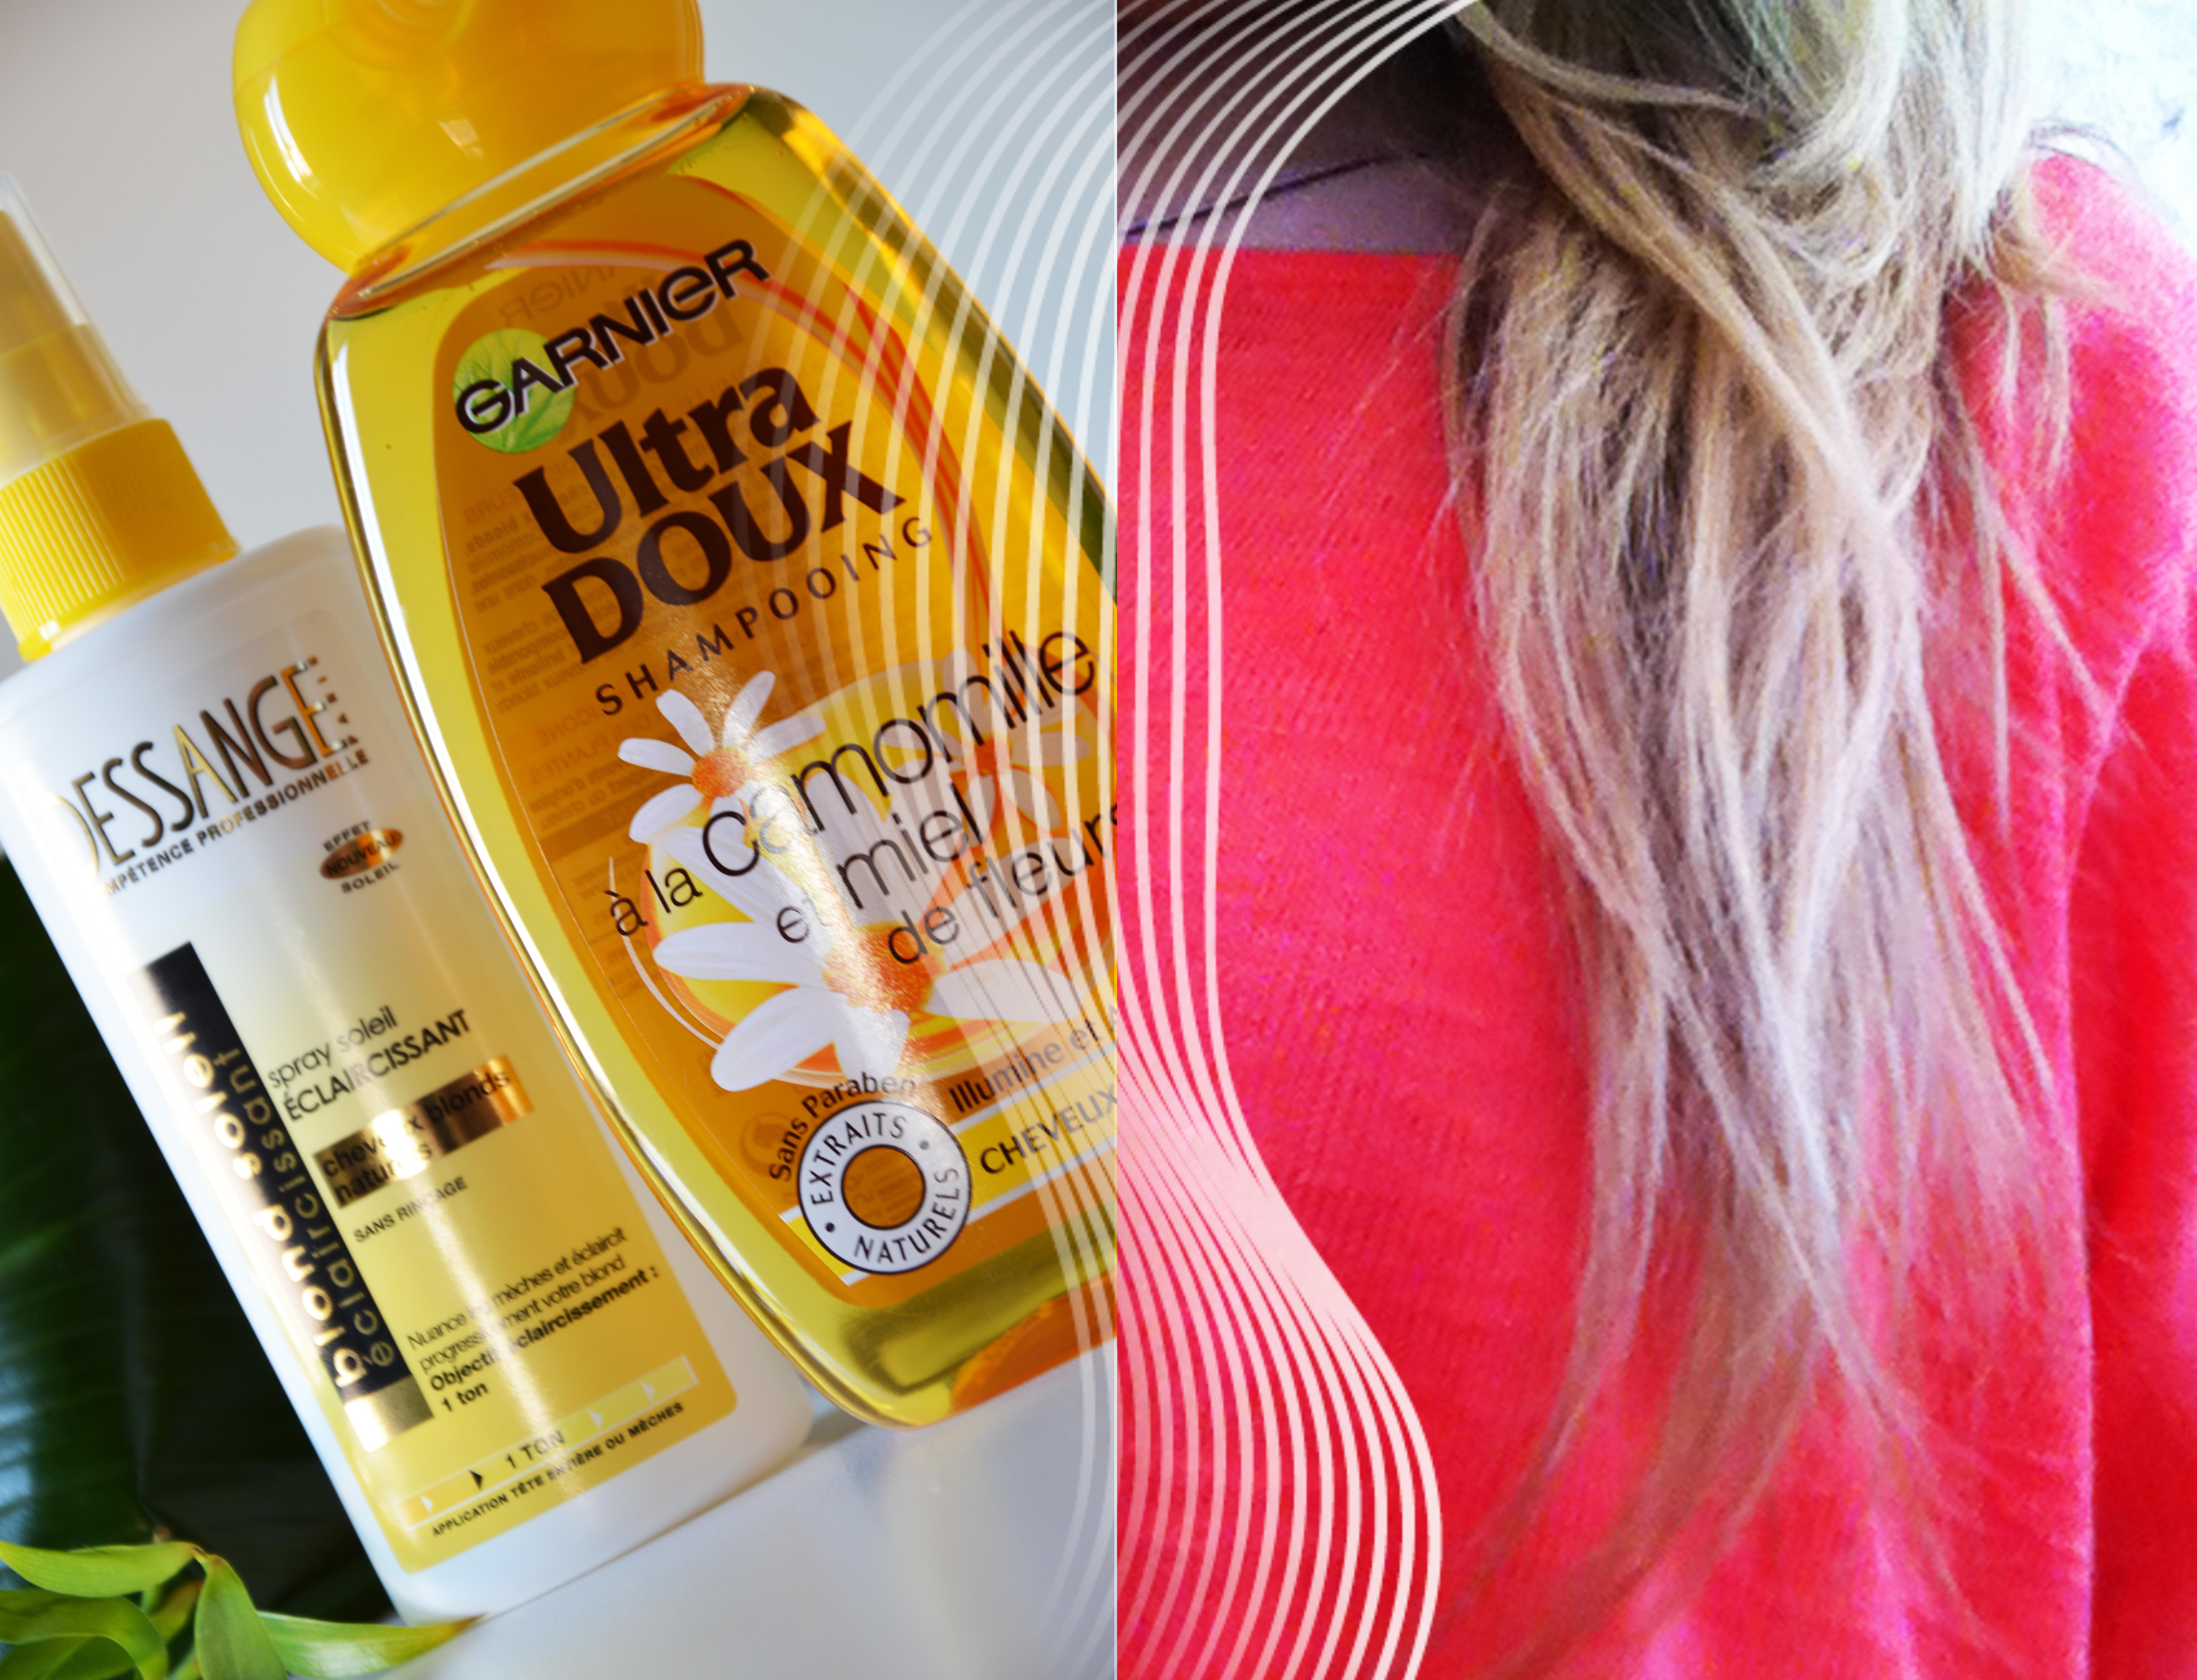 alittleb_blog_beaute_cheveux_garnier_dessange_resultat - Spray Colorant Cheveux